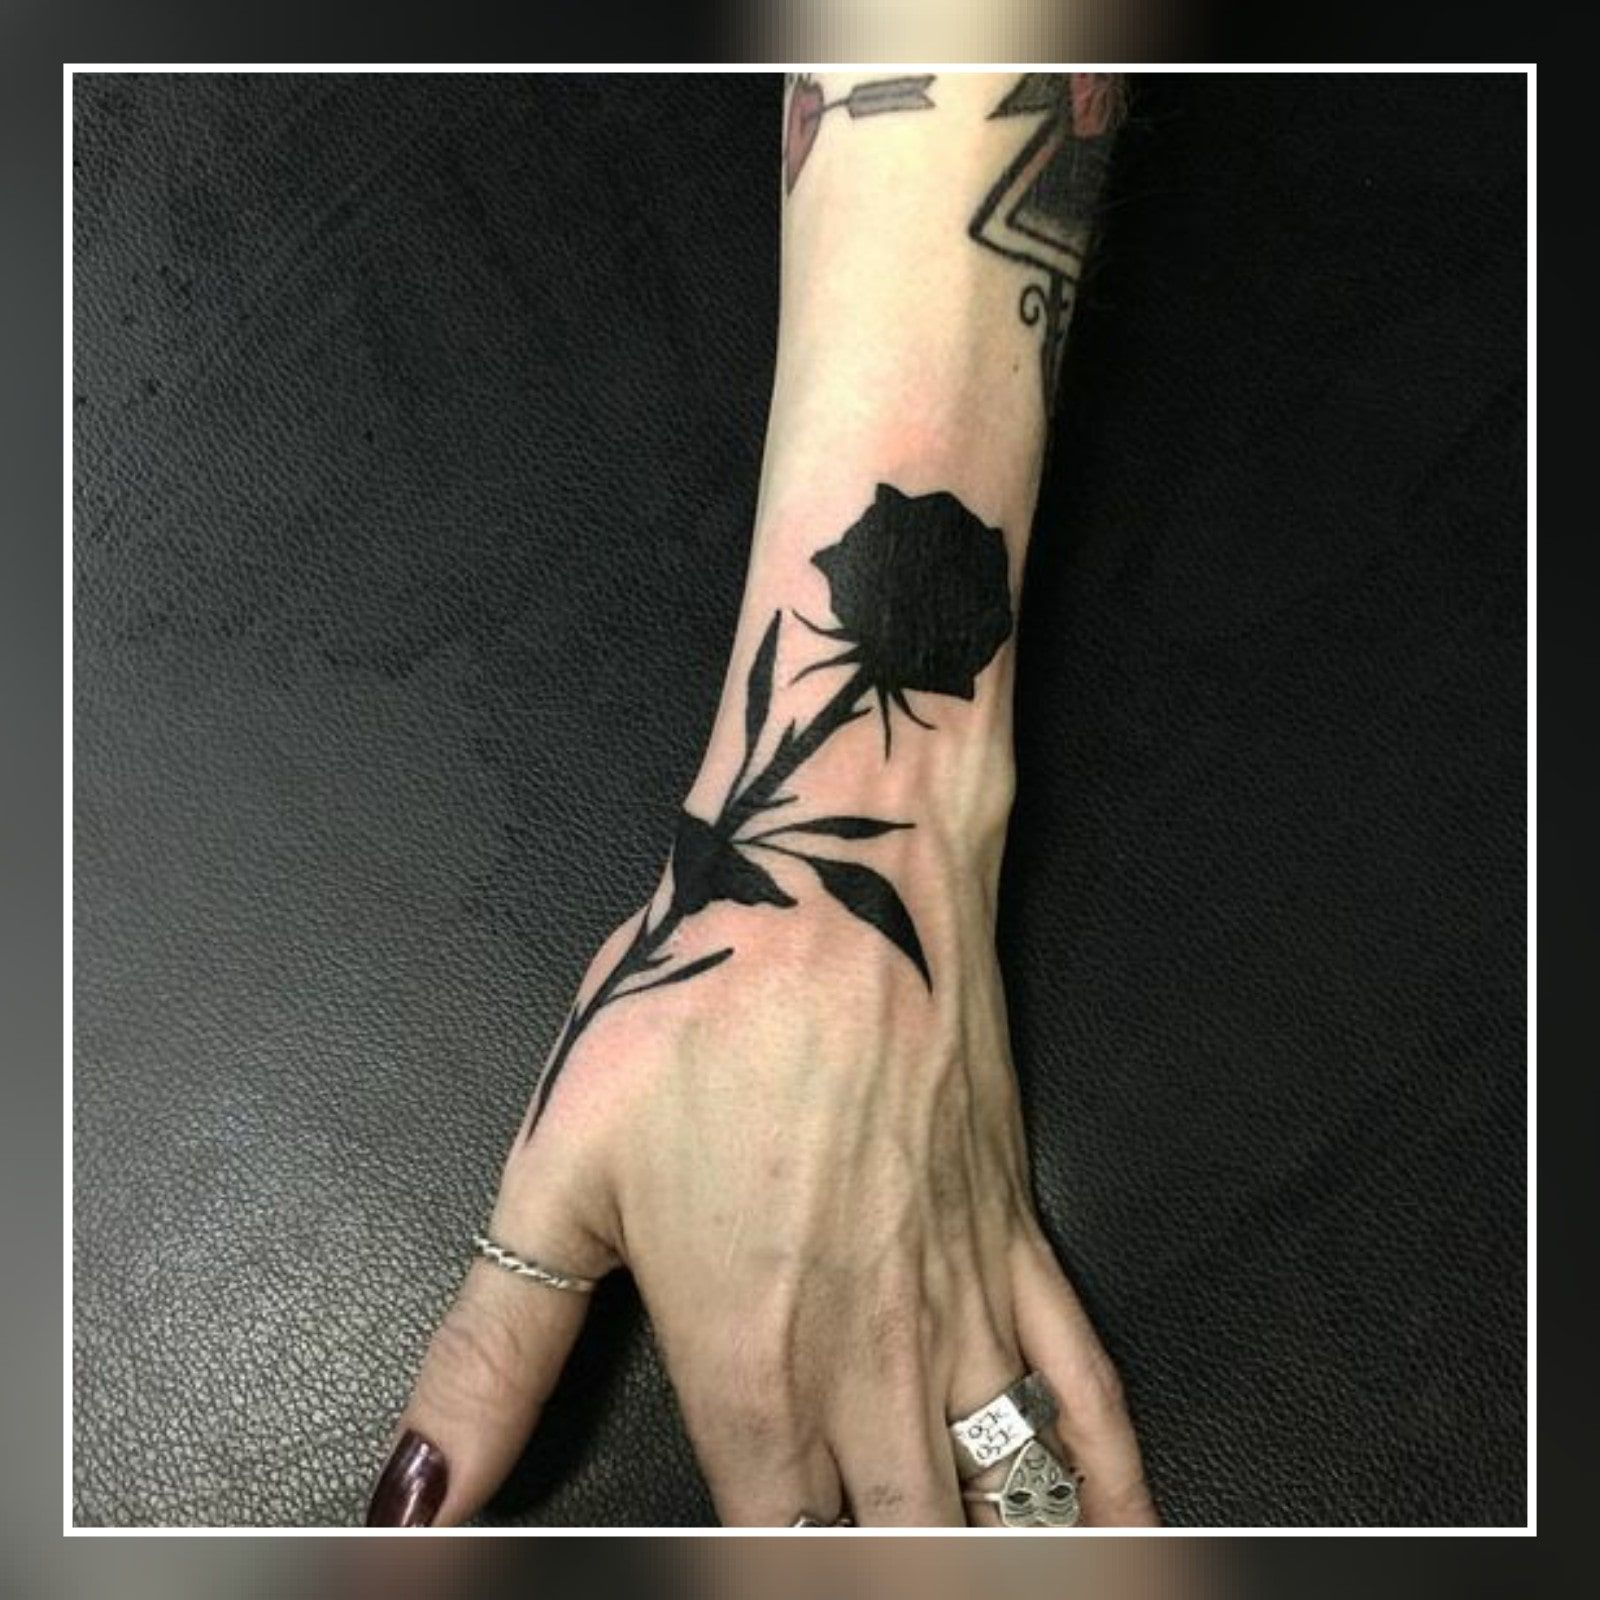 45 Small Black Rose Tattoo Ideas Black Rose Tattoos Rose Tattoos Rose Hand Tattoo